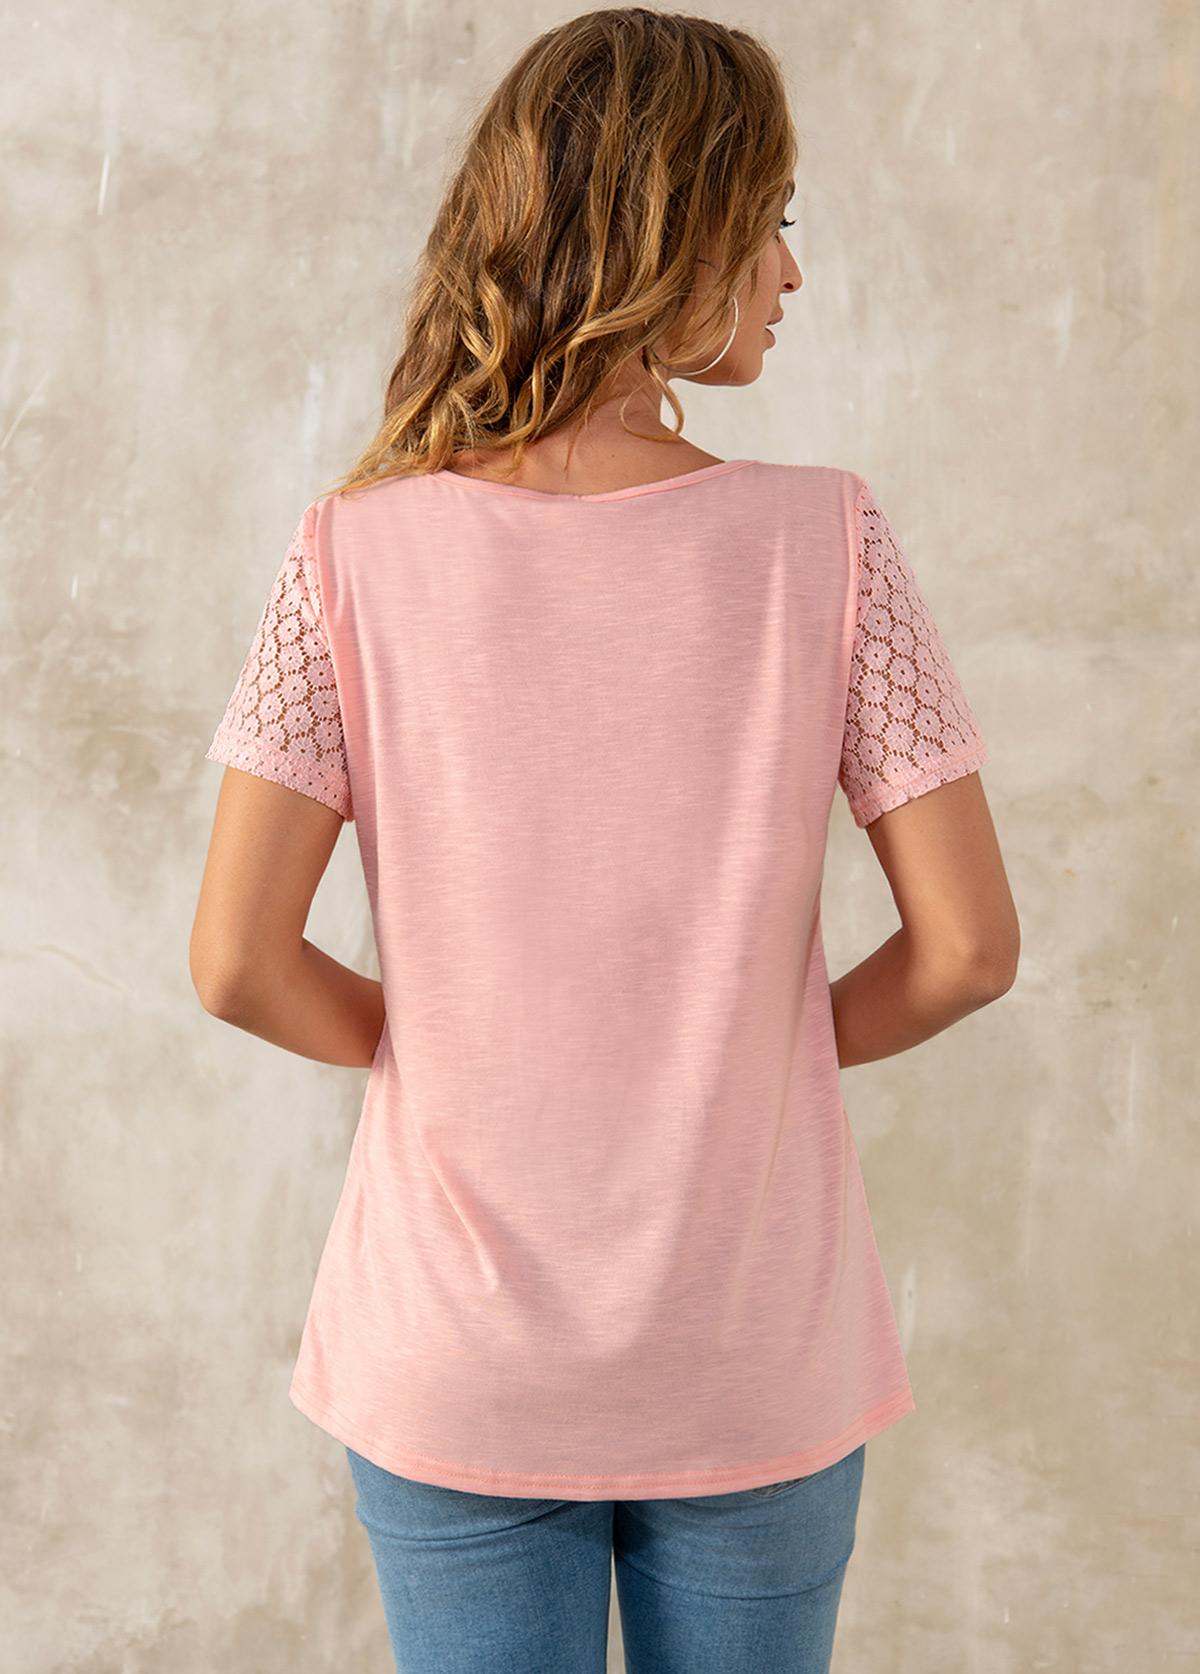 Solid Lace Patchwork Short Sleeve V Neck T Shirt